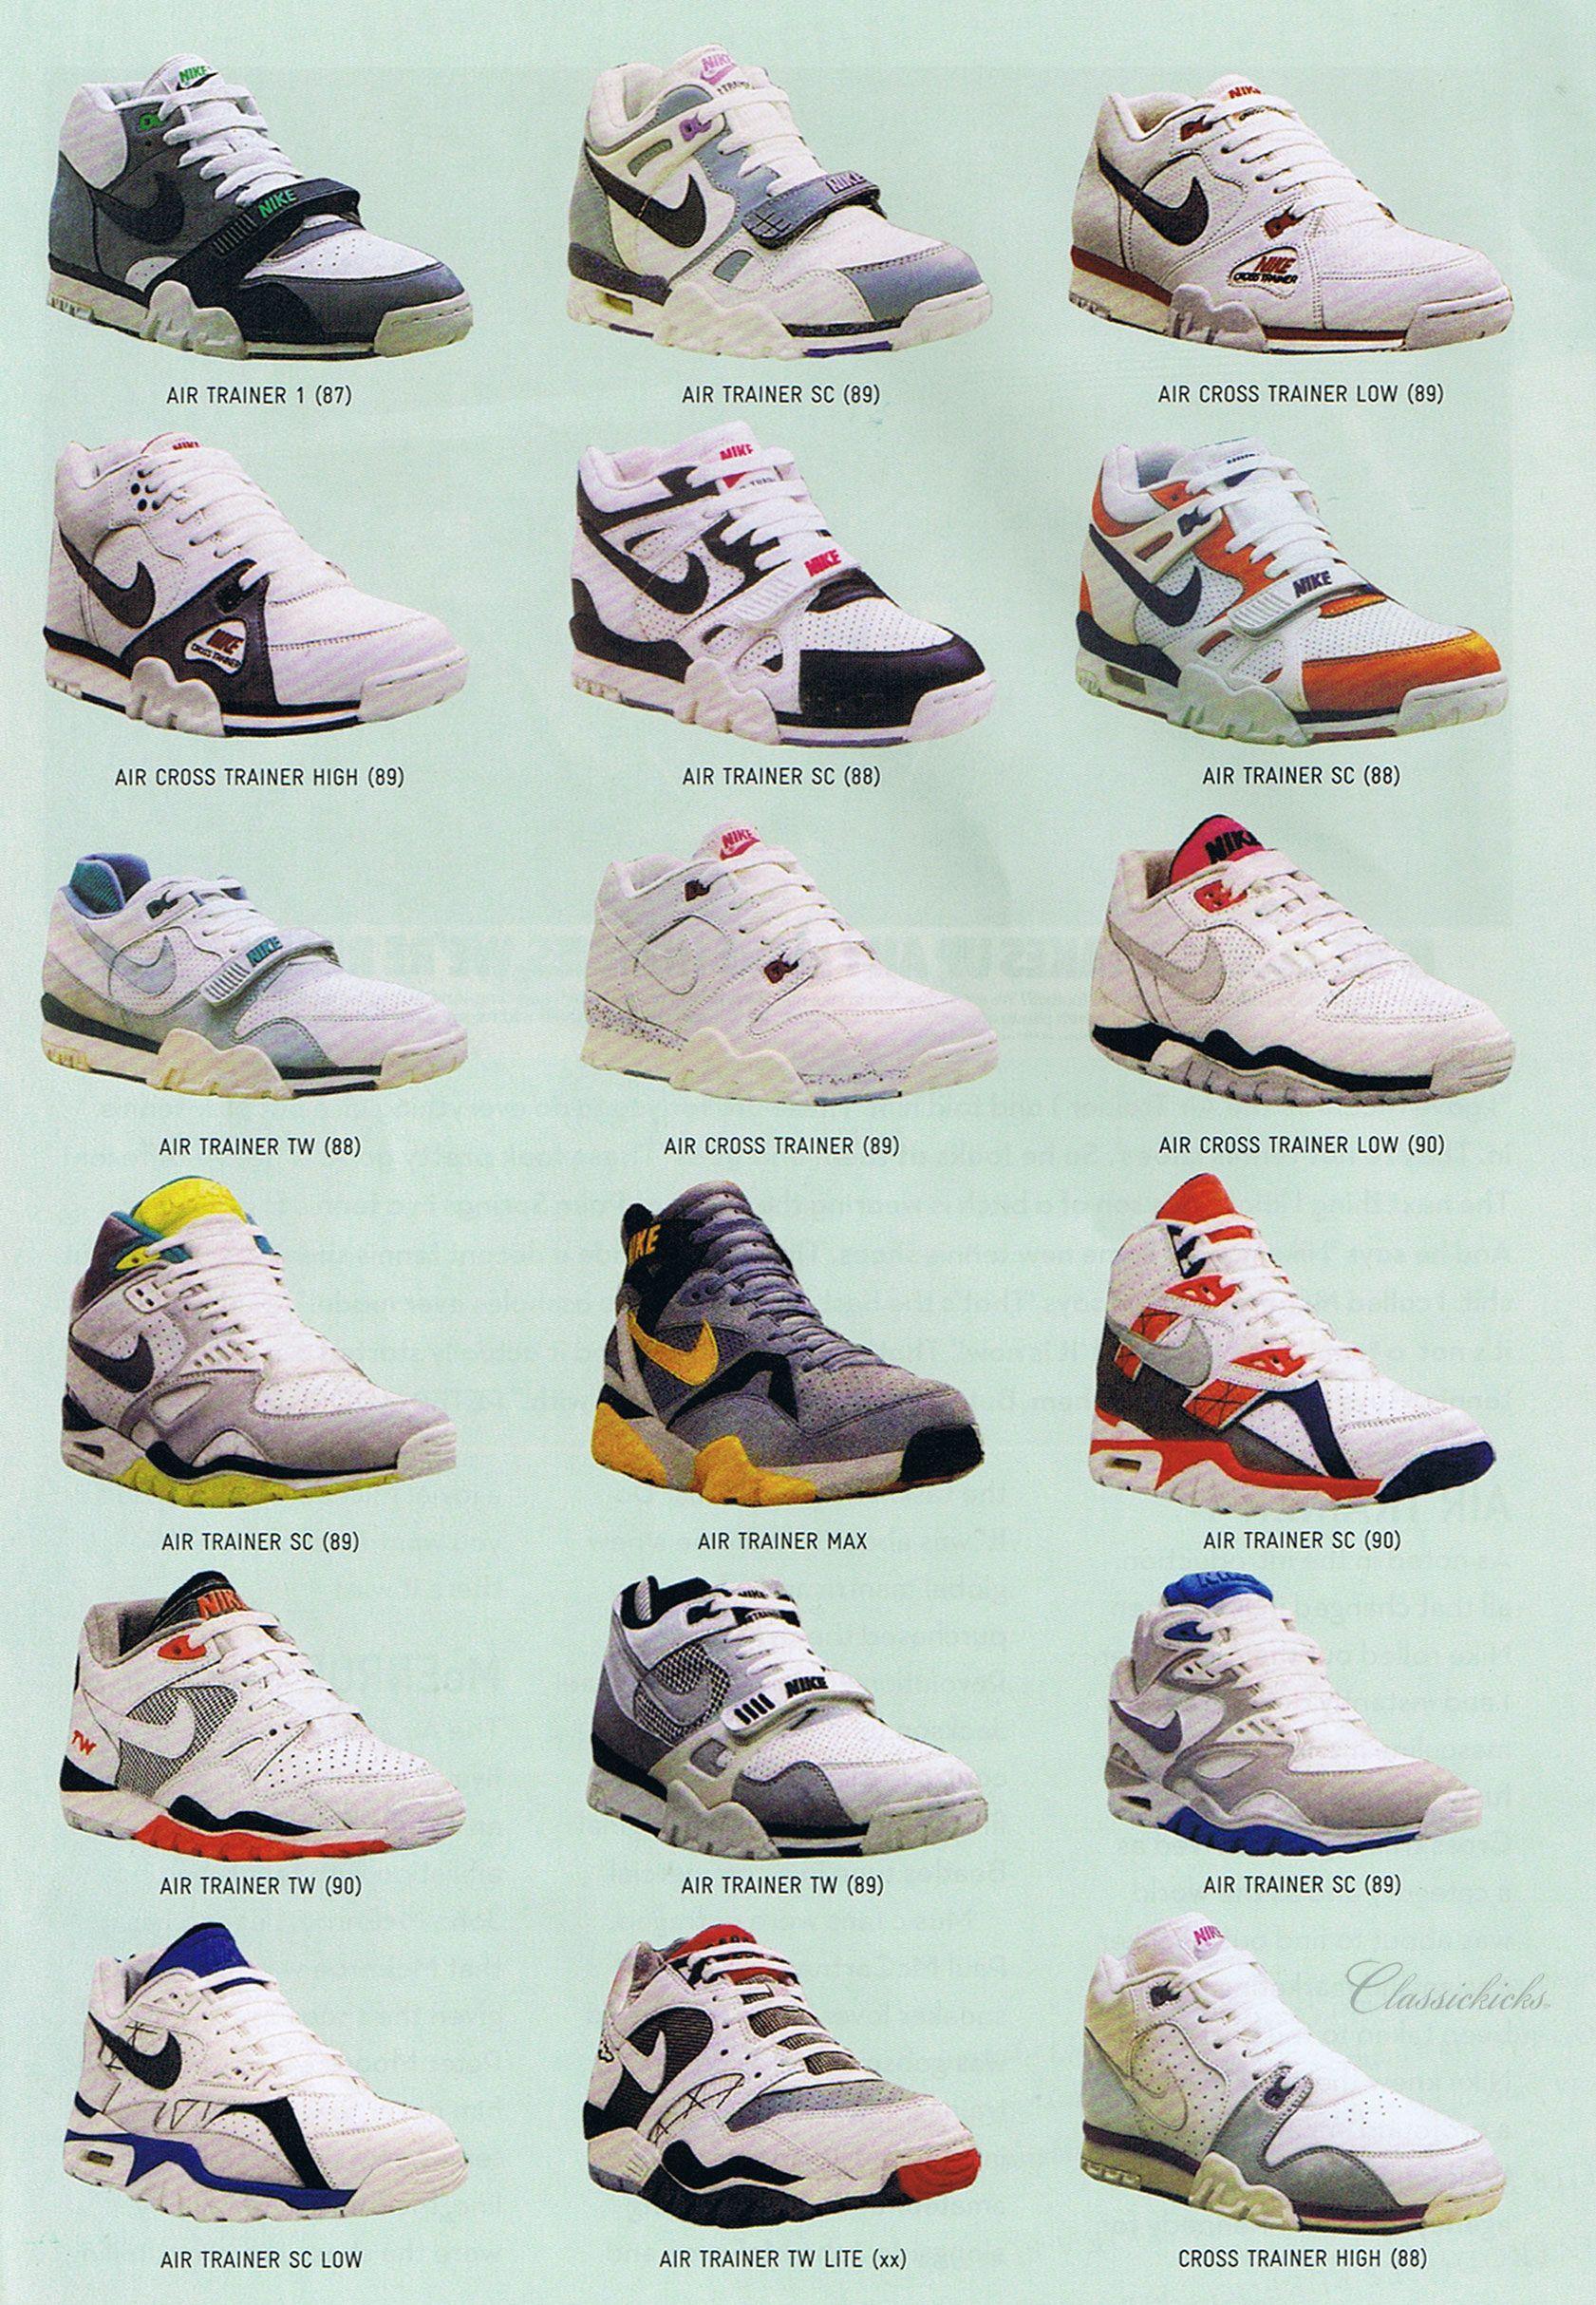 Bo jackson shoes, Vintage sneakers